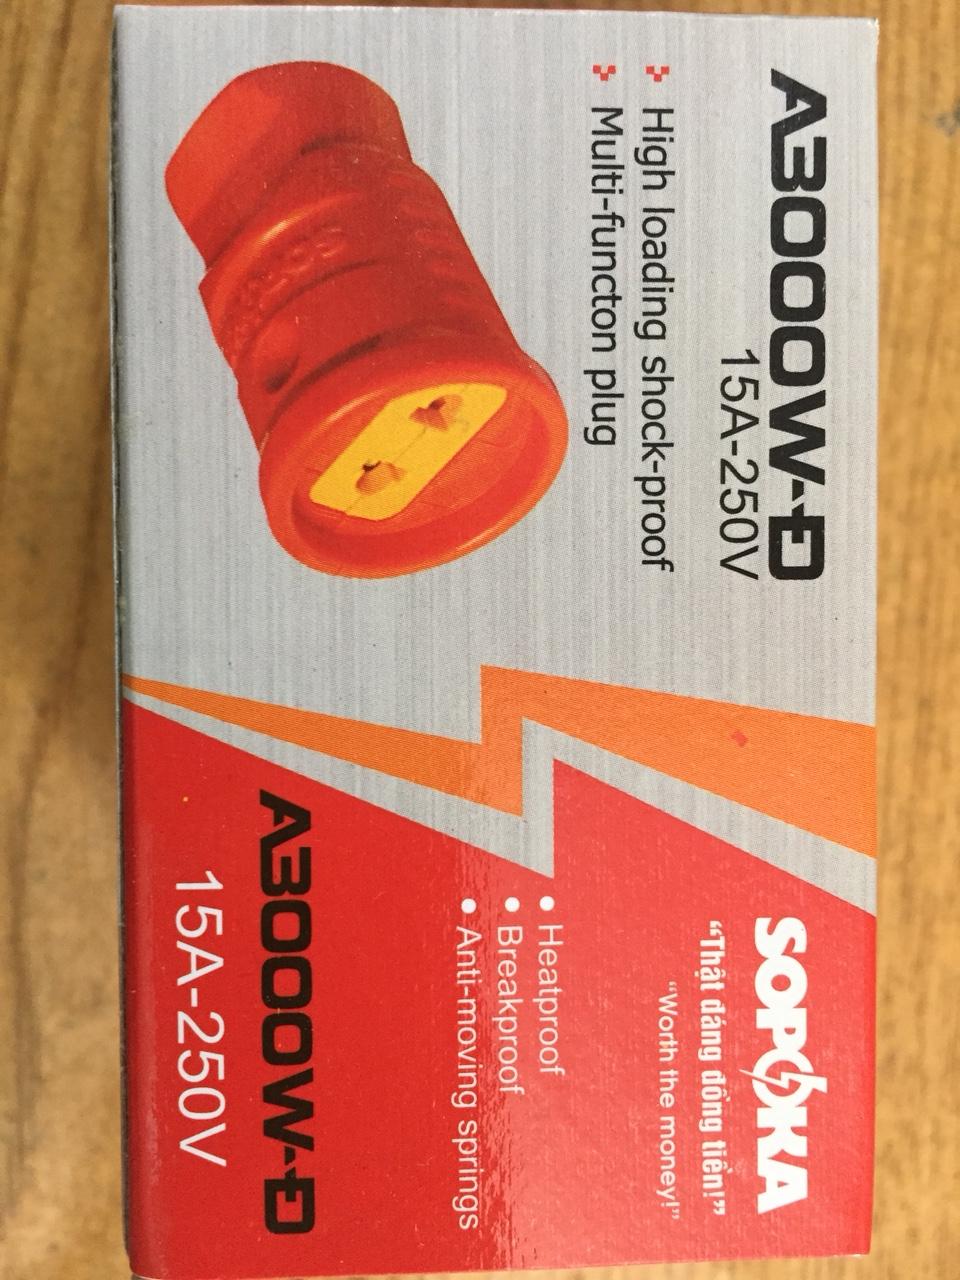 3000w load-bearing plug A3000w-Đ SOPOKA